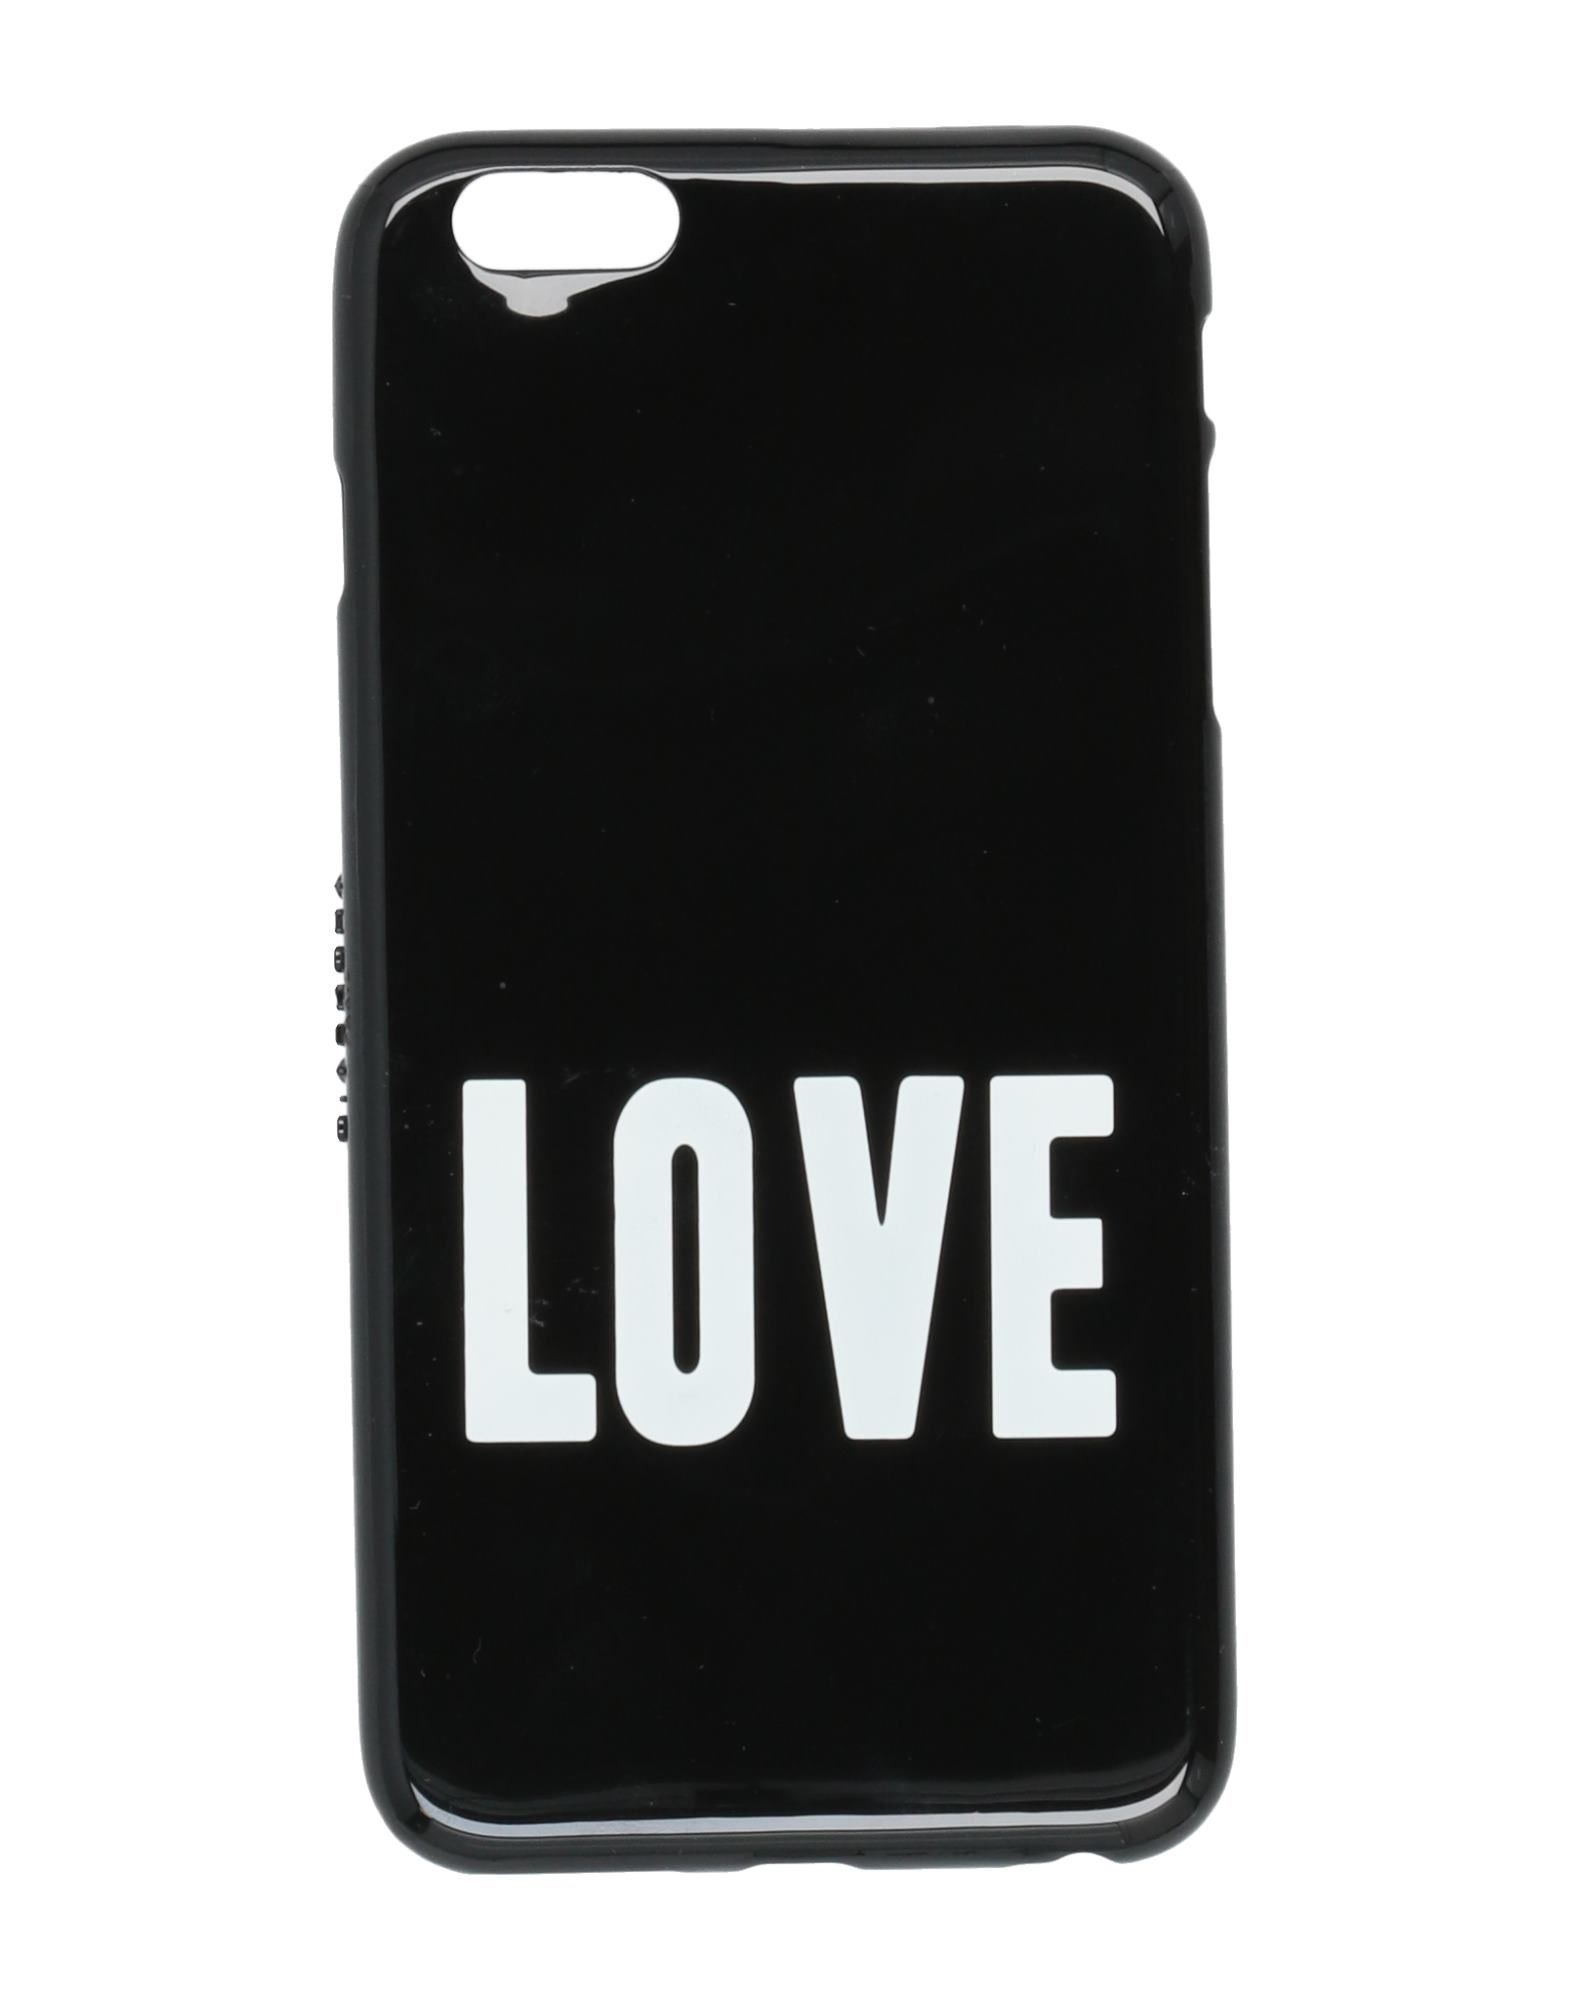 Фото - GIVENCHY Чехол чехол накладка для apple iphone 6 6s deppa gel plus case 85213 pink клип кейс полиуретан